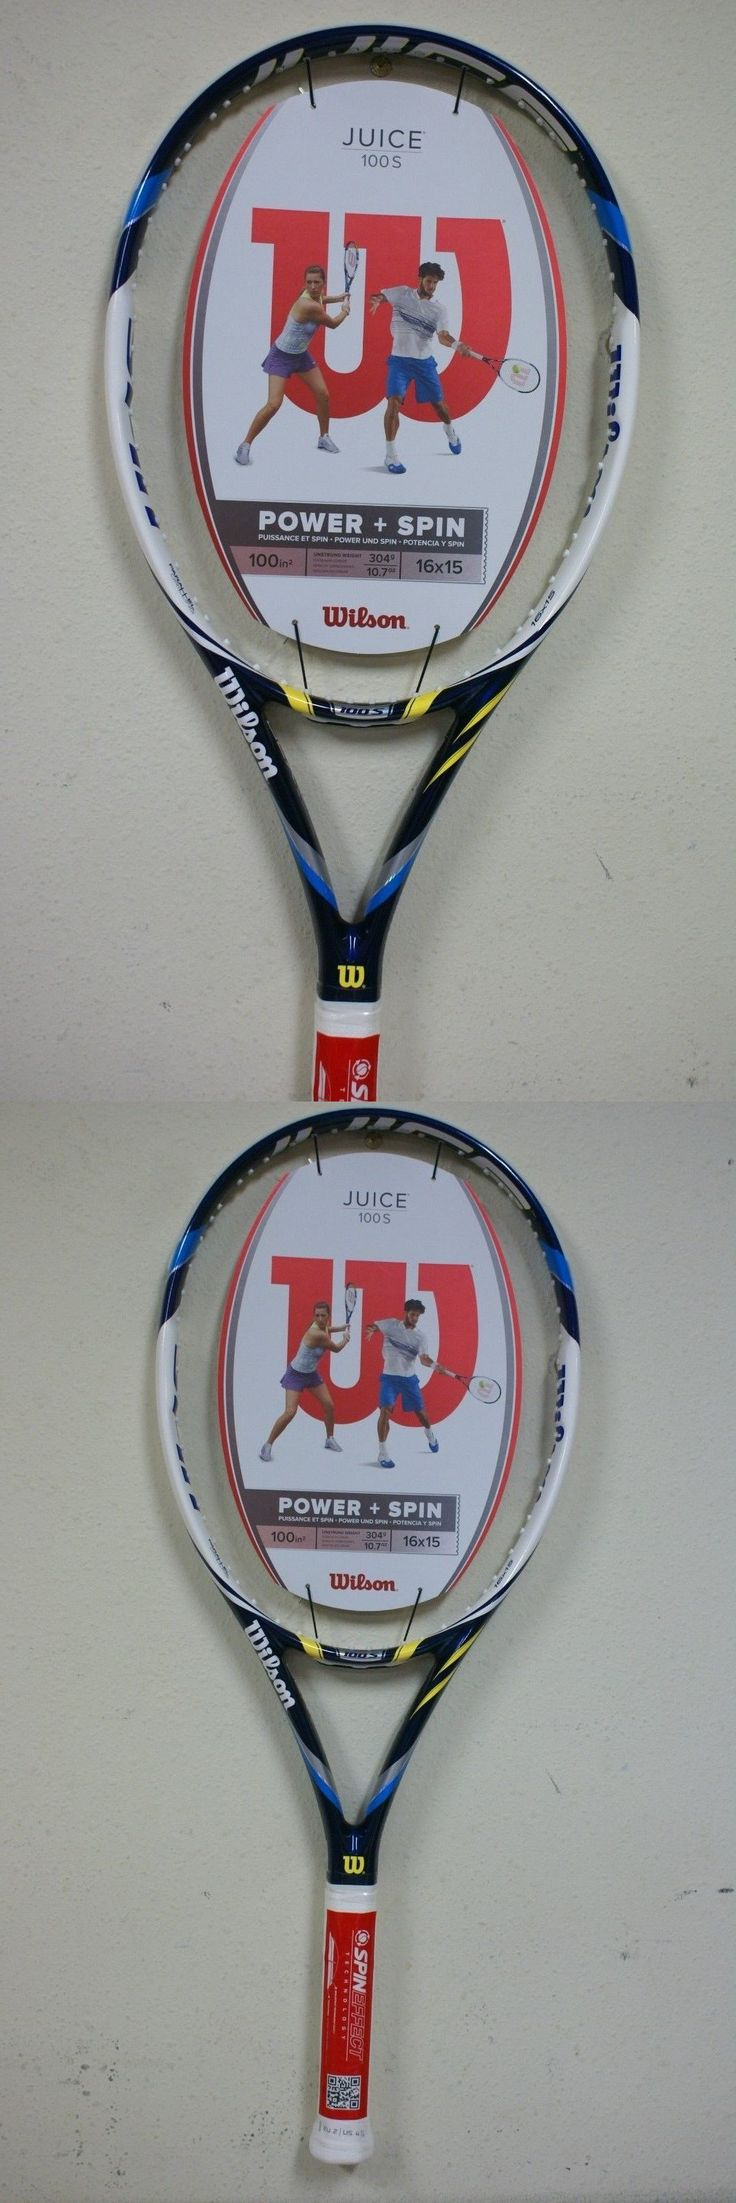 Racquets 20871: Wilson Juice 100S Tennis Racquet Grip Size 4 1 4 -> BUY IT NOW ONLY: $129.99 on eBay!